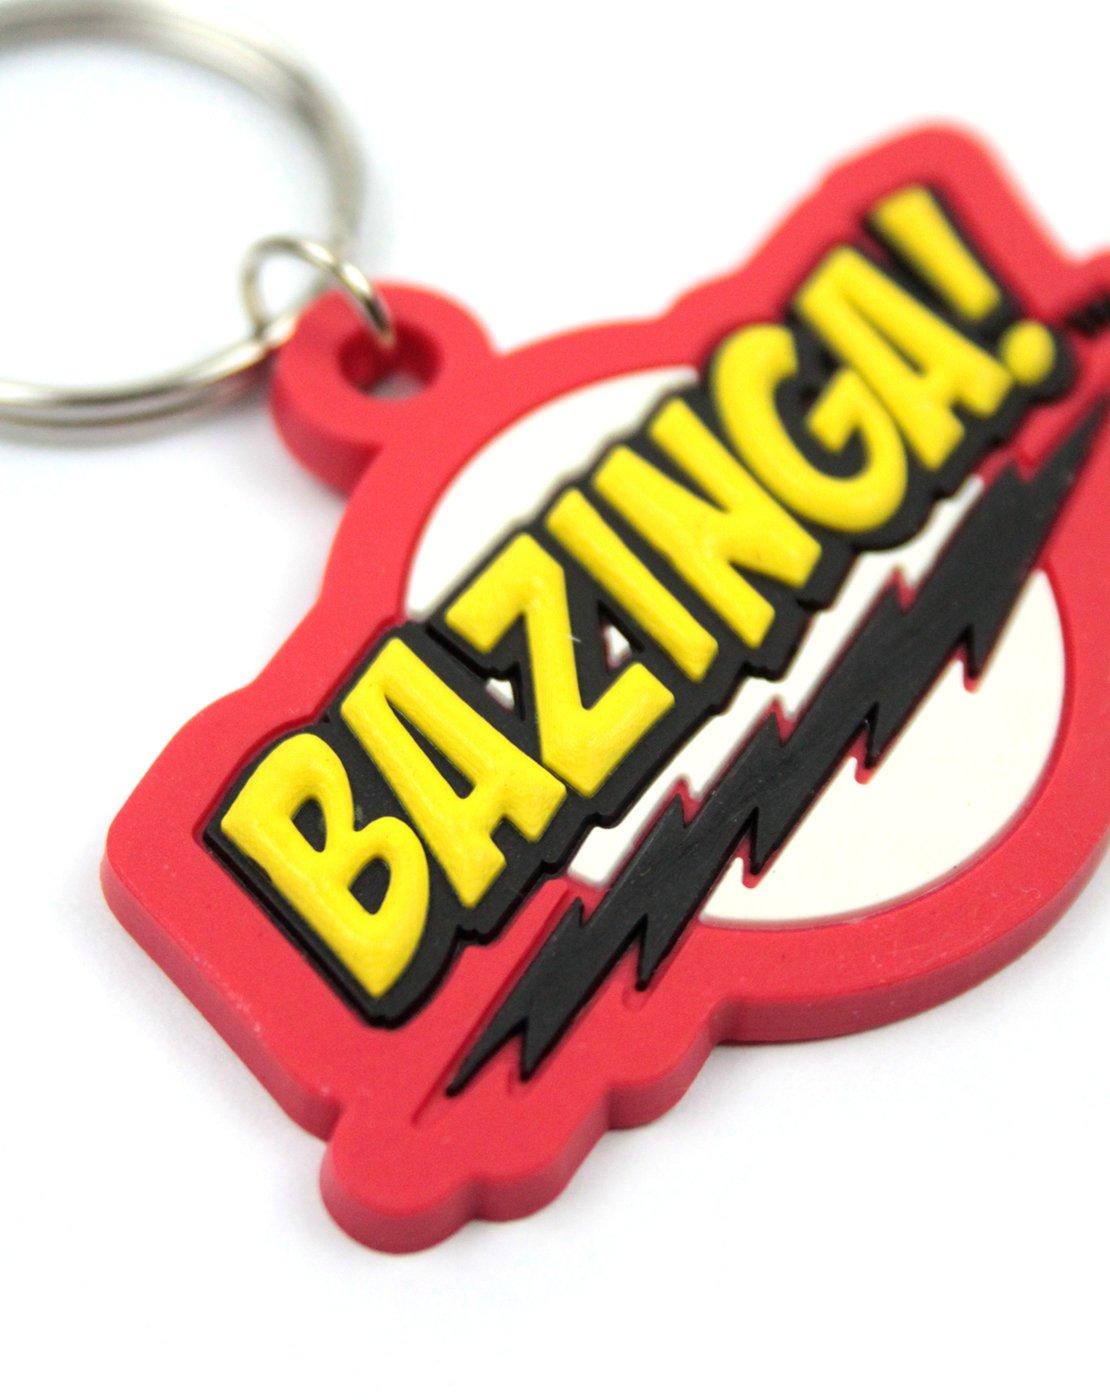 Official Big Bang Theory Bazinga Keyring: Amazon.co.uk: Office Products